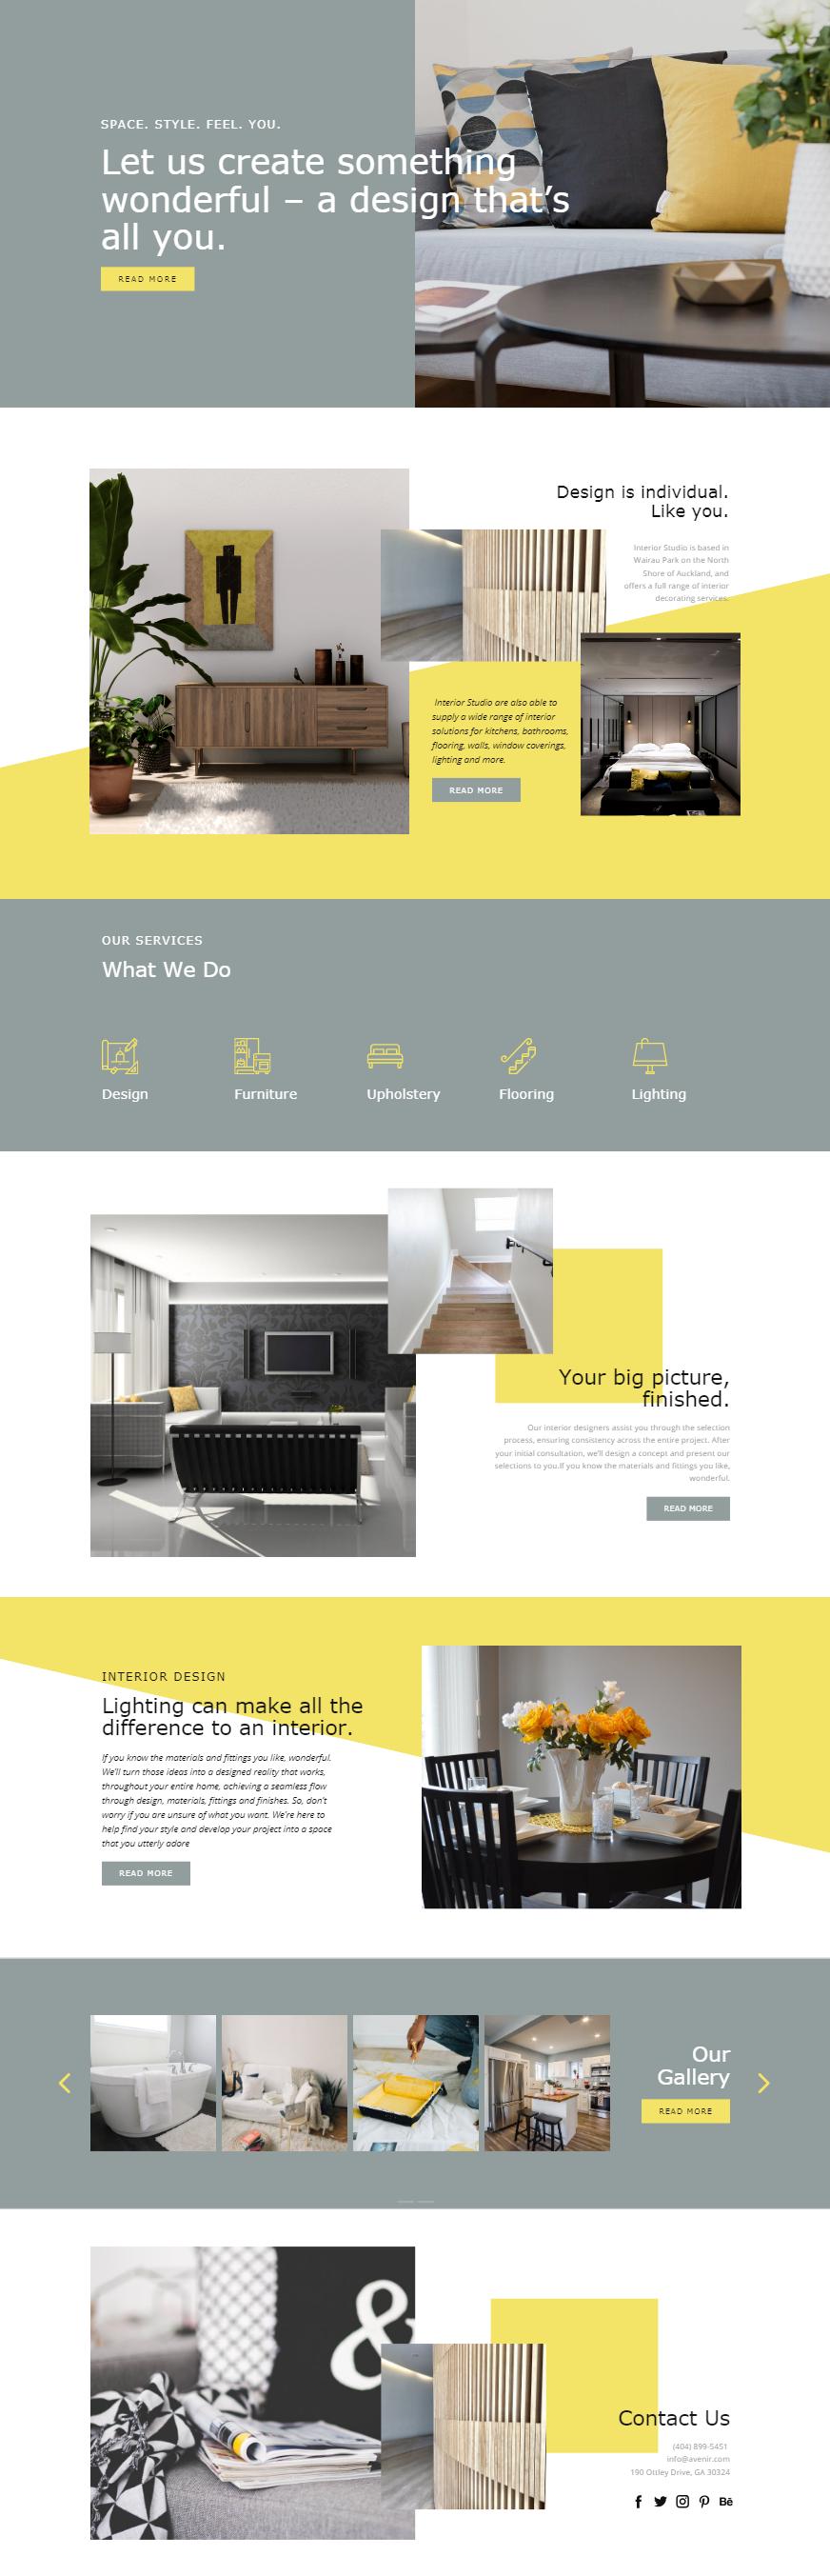 Free Template by Nicepage Builder   Interior design website ...